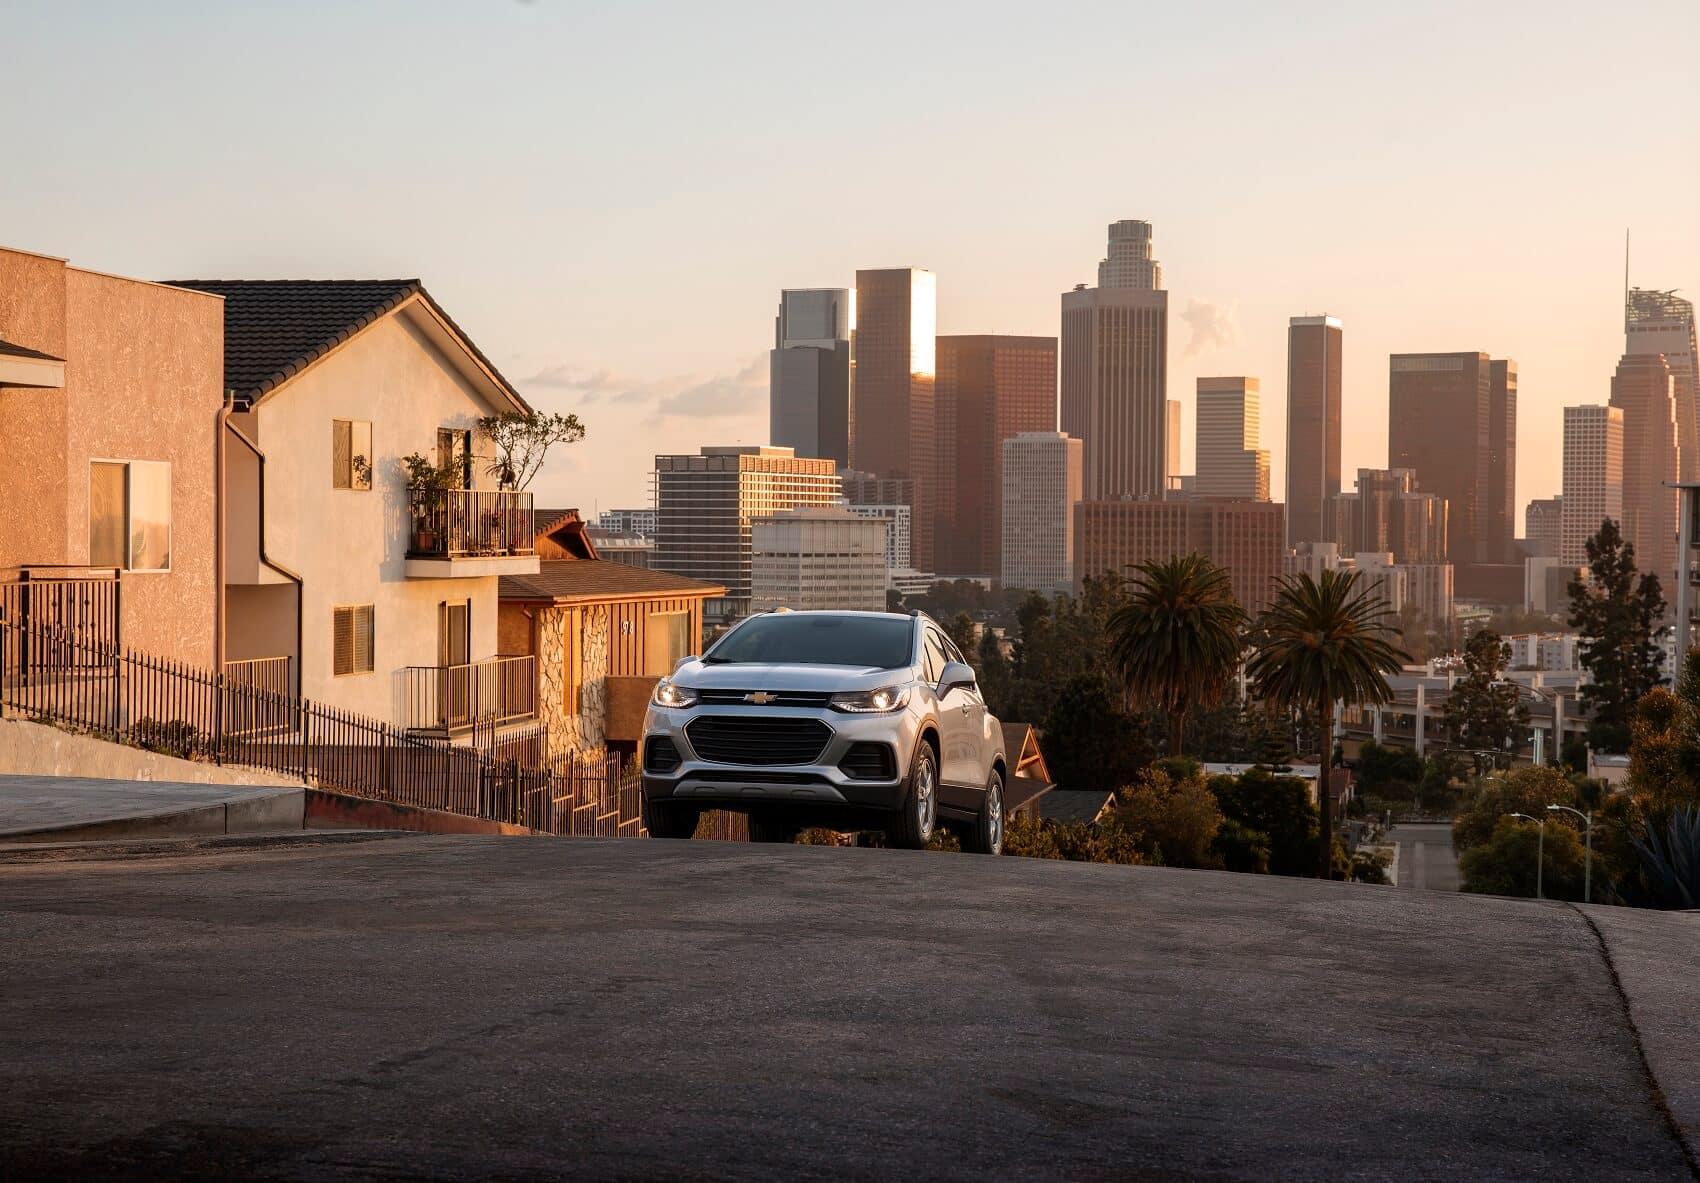 CHEVY CARS, TRUCKS, AND SUVS ECONOMY